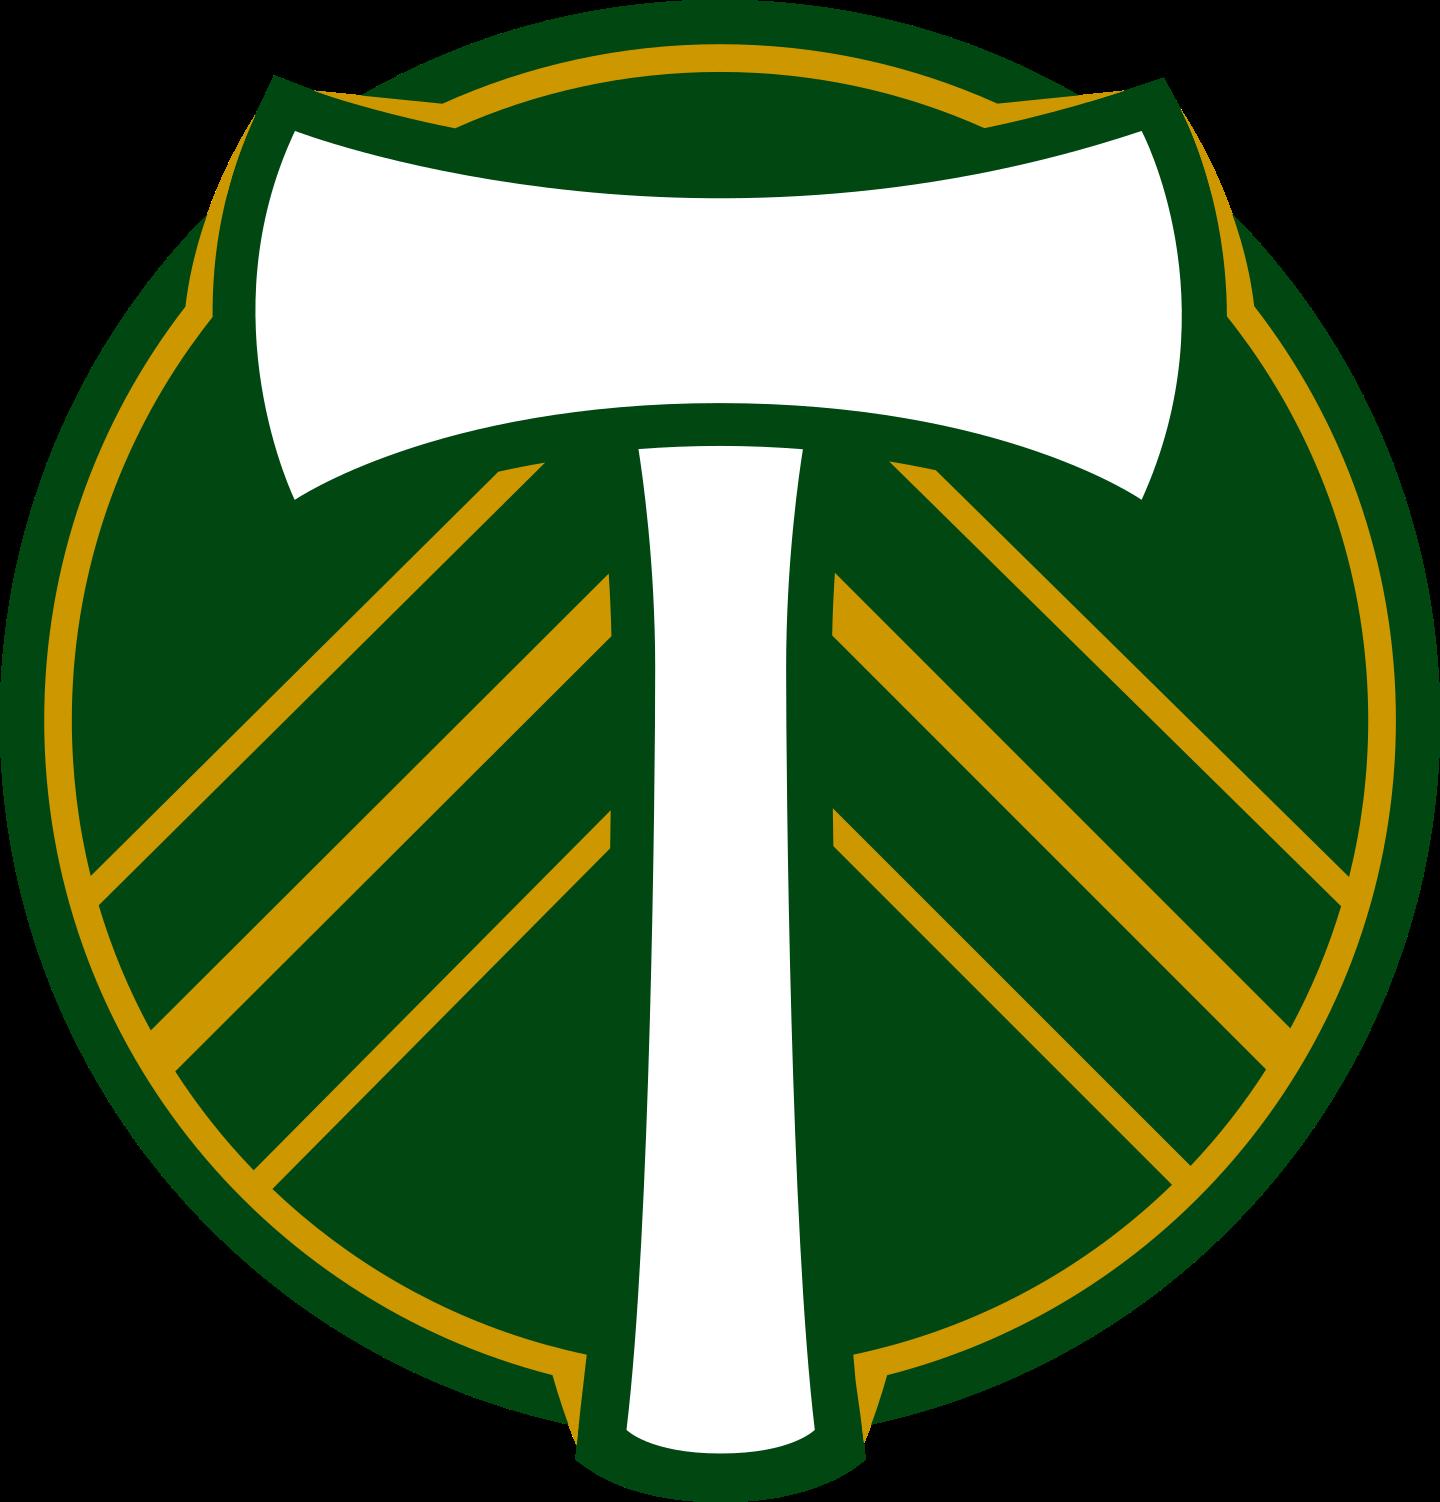 portland timbers logo 2 - Portland Timbers Logo